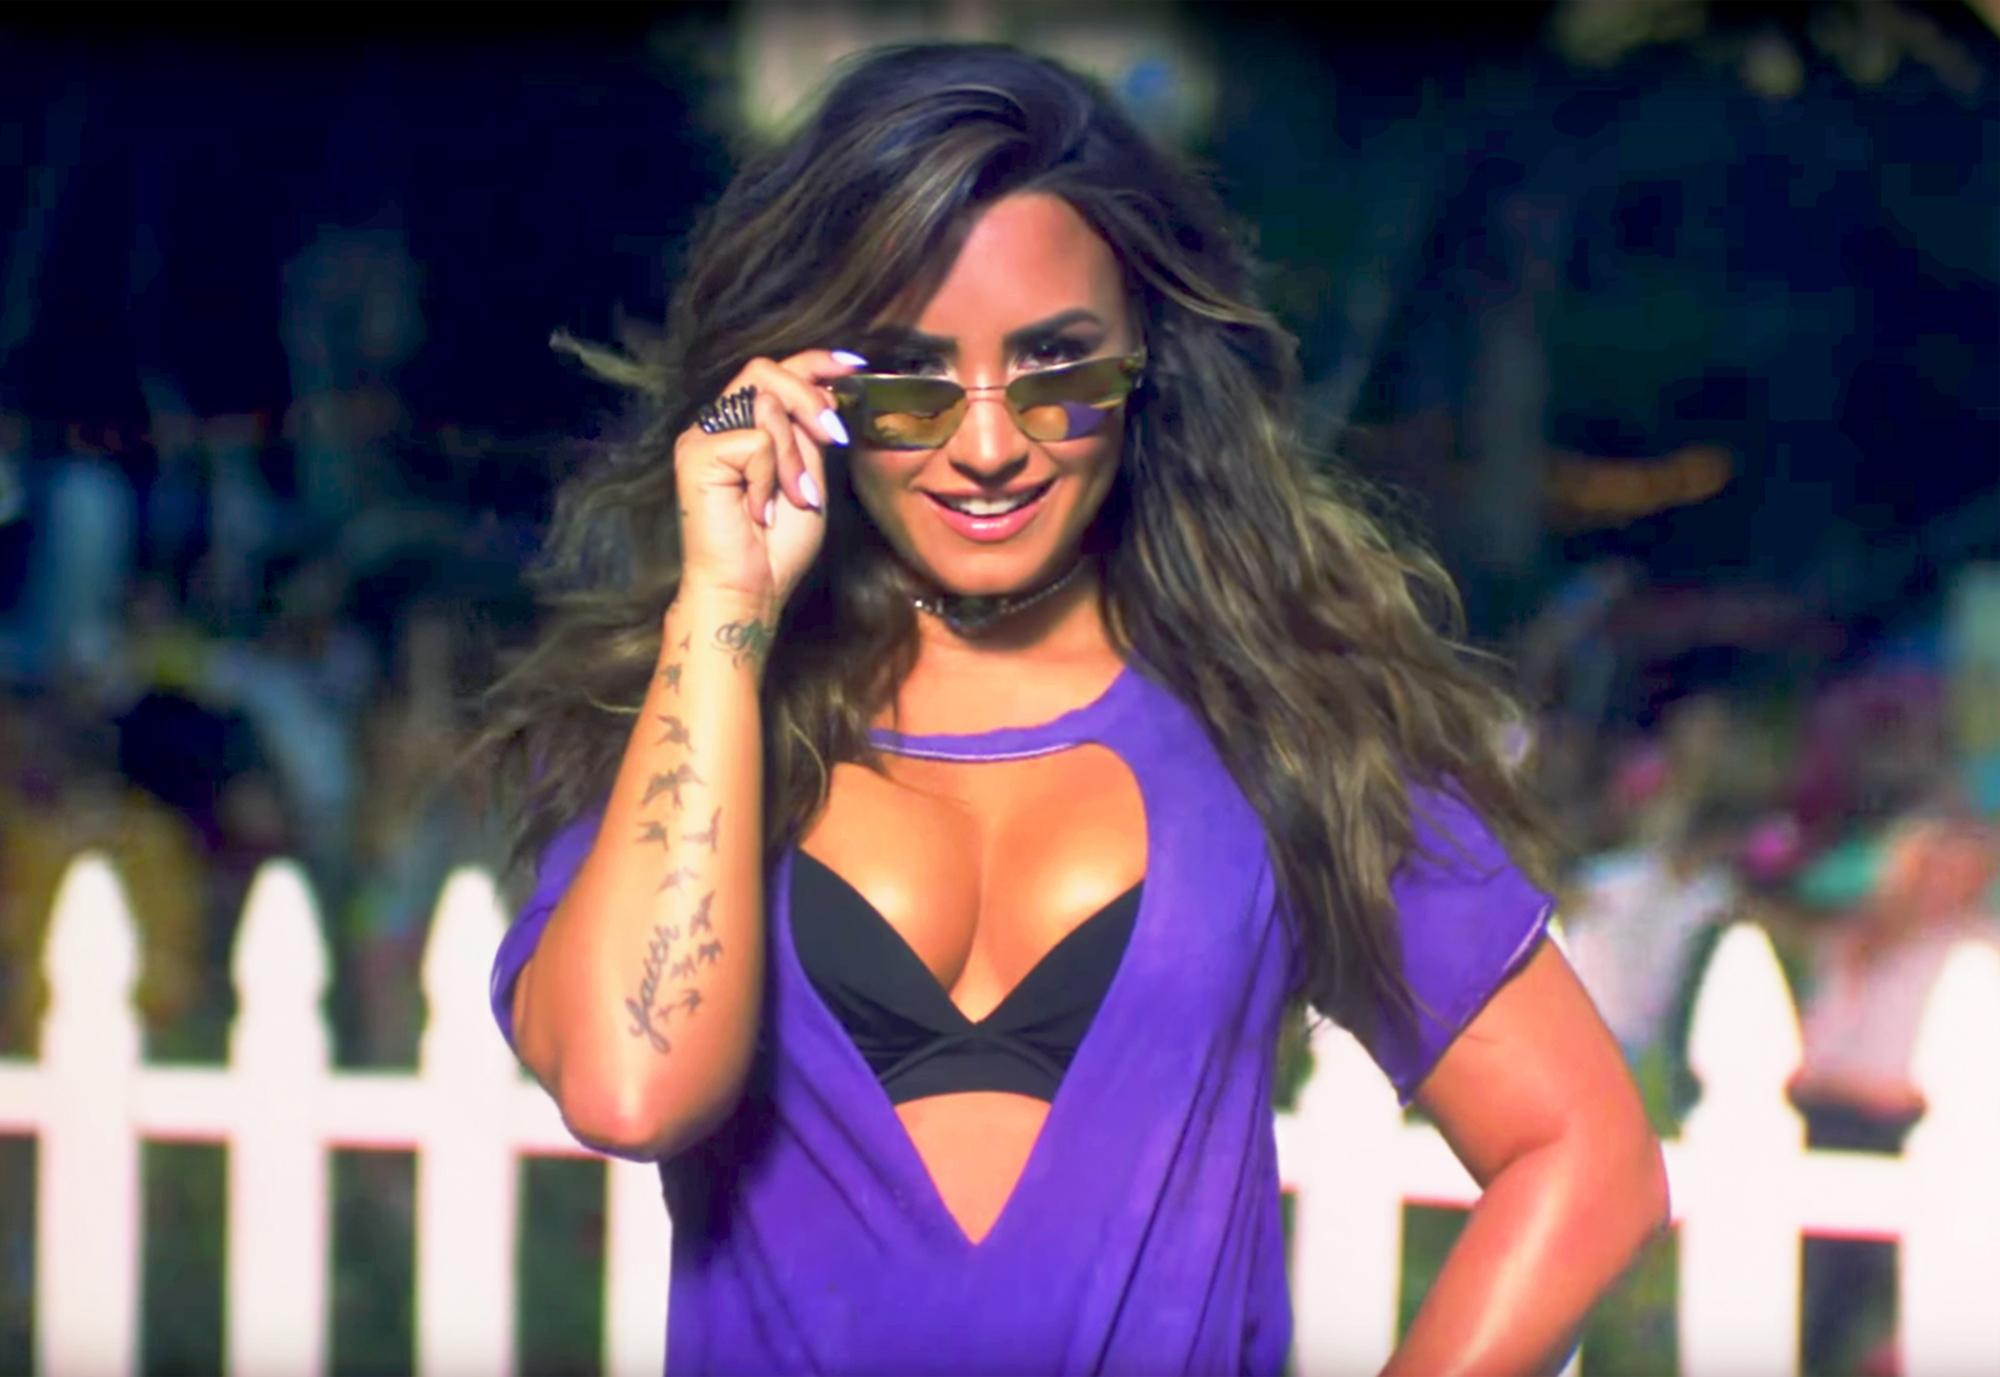 Girl Under Rain Live Wallpaper Demi Lovato Parties With Paris Hilton Jamie Foxx In New Video